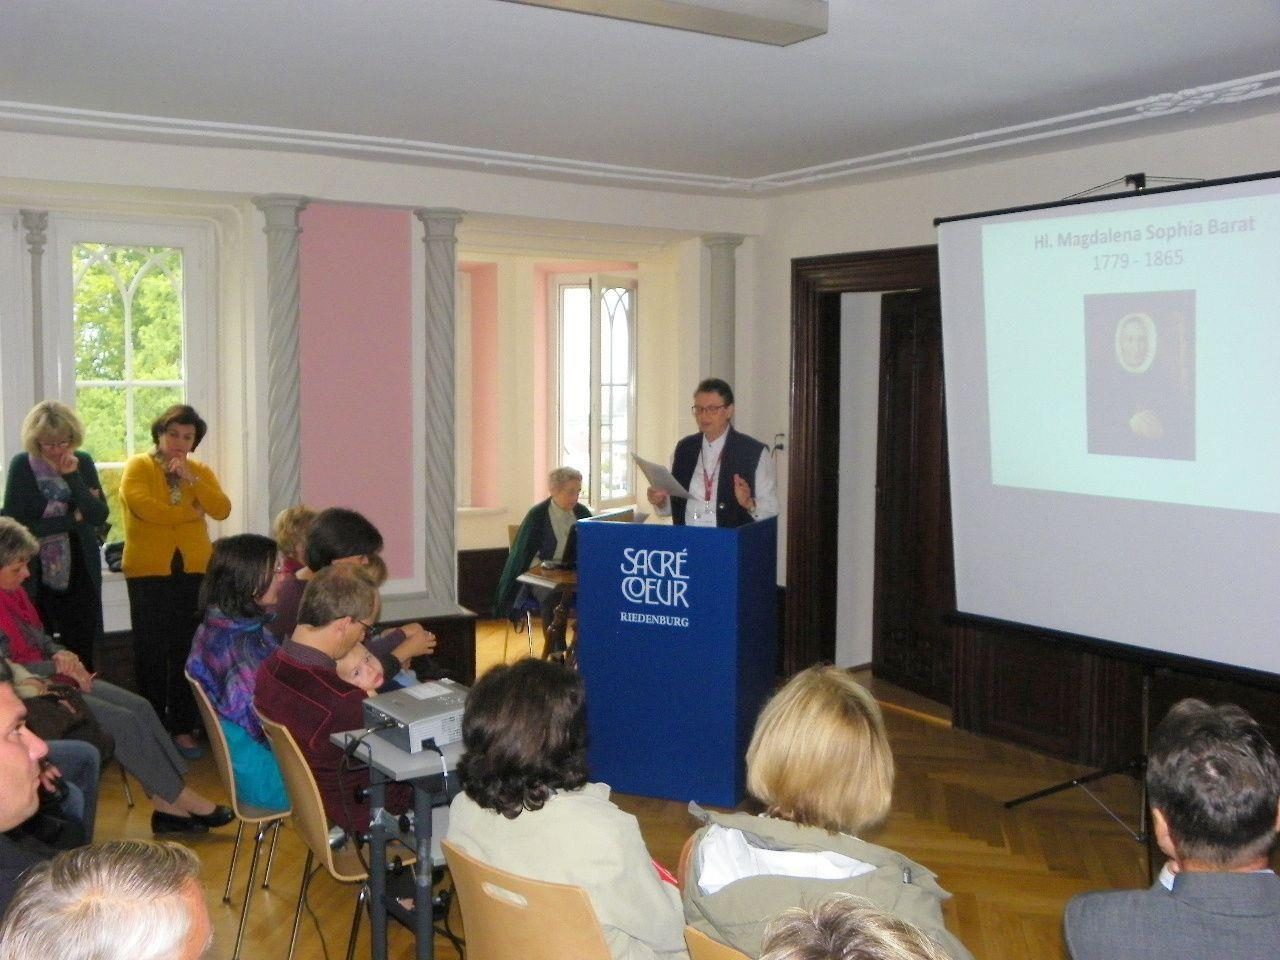 Sr. Dr. Christine Öhlinger informierte über die Entstehungsgeschichte des Sacré Coeur  Sacré Coeur Riedenburg